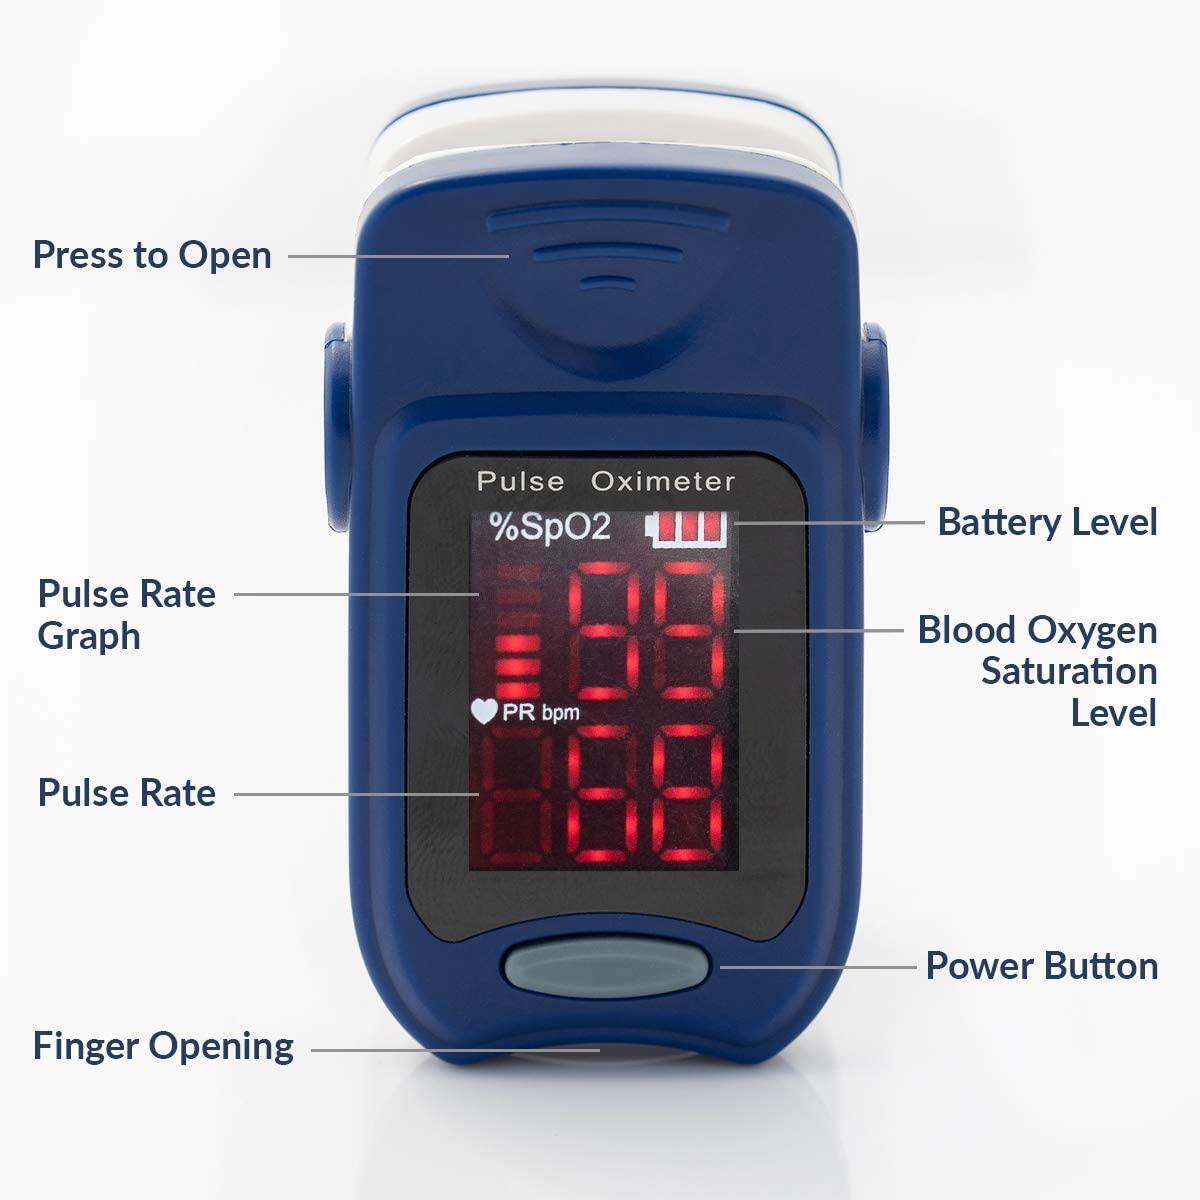 Pulse Oximeter Fingertip – Accurate Blood Oxygen Saturation Monitor – SpO2 & Finger Pulse Oximeter – Fingertip Pulse Oximeter with Easy to Read Digital Display